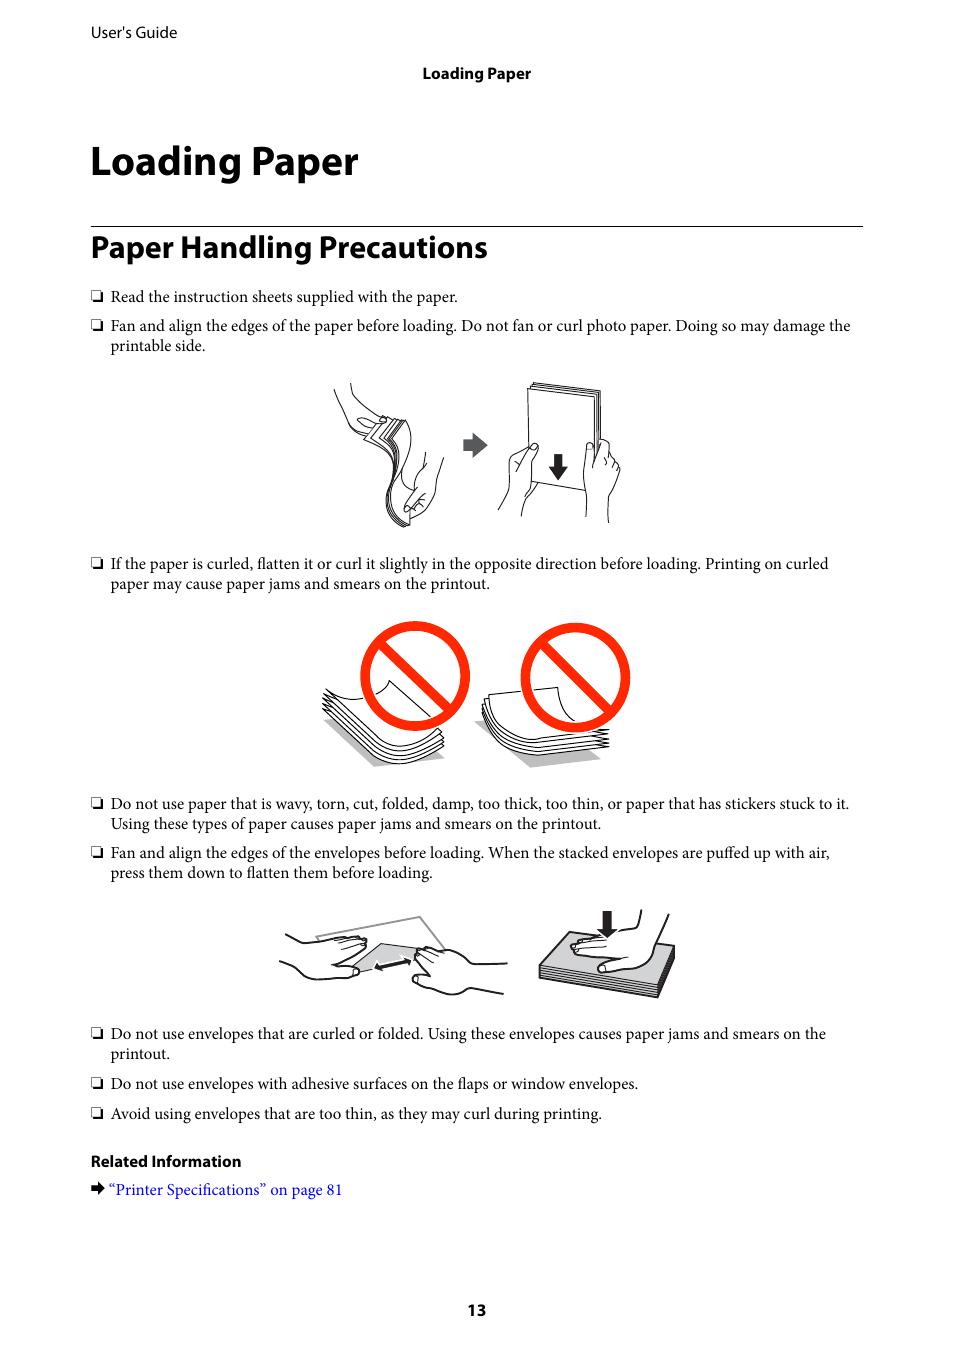 Loading paper, Paper handling precautions | Epson L805 User